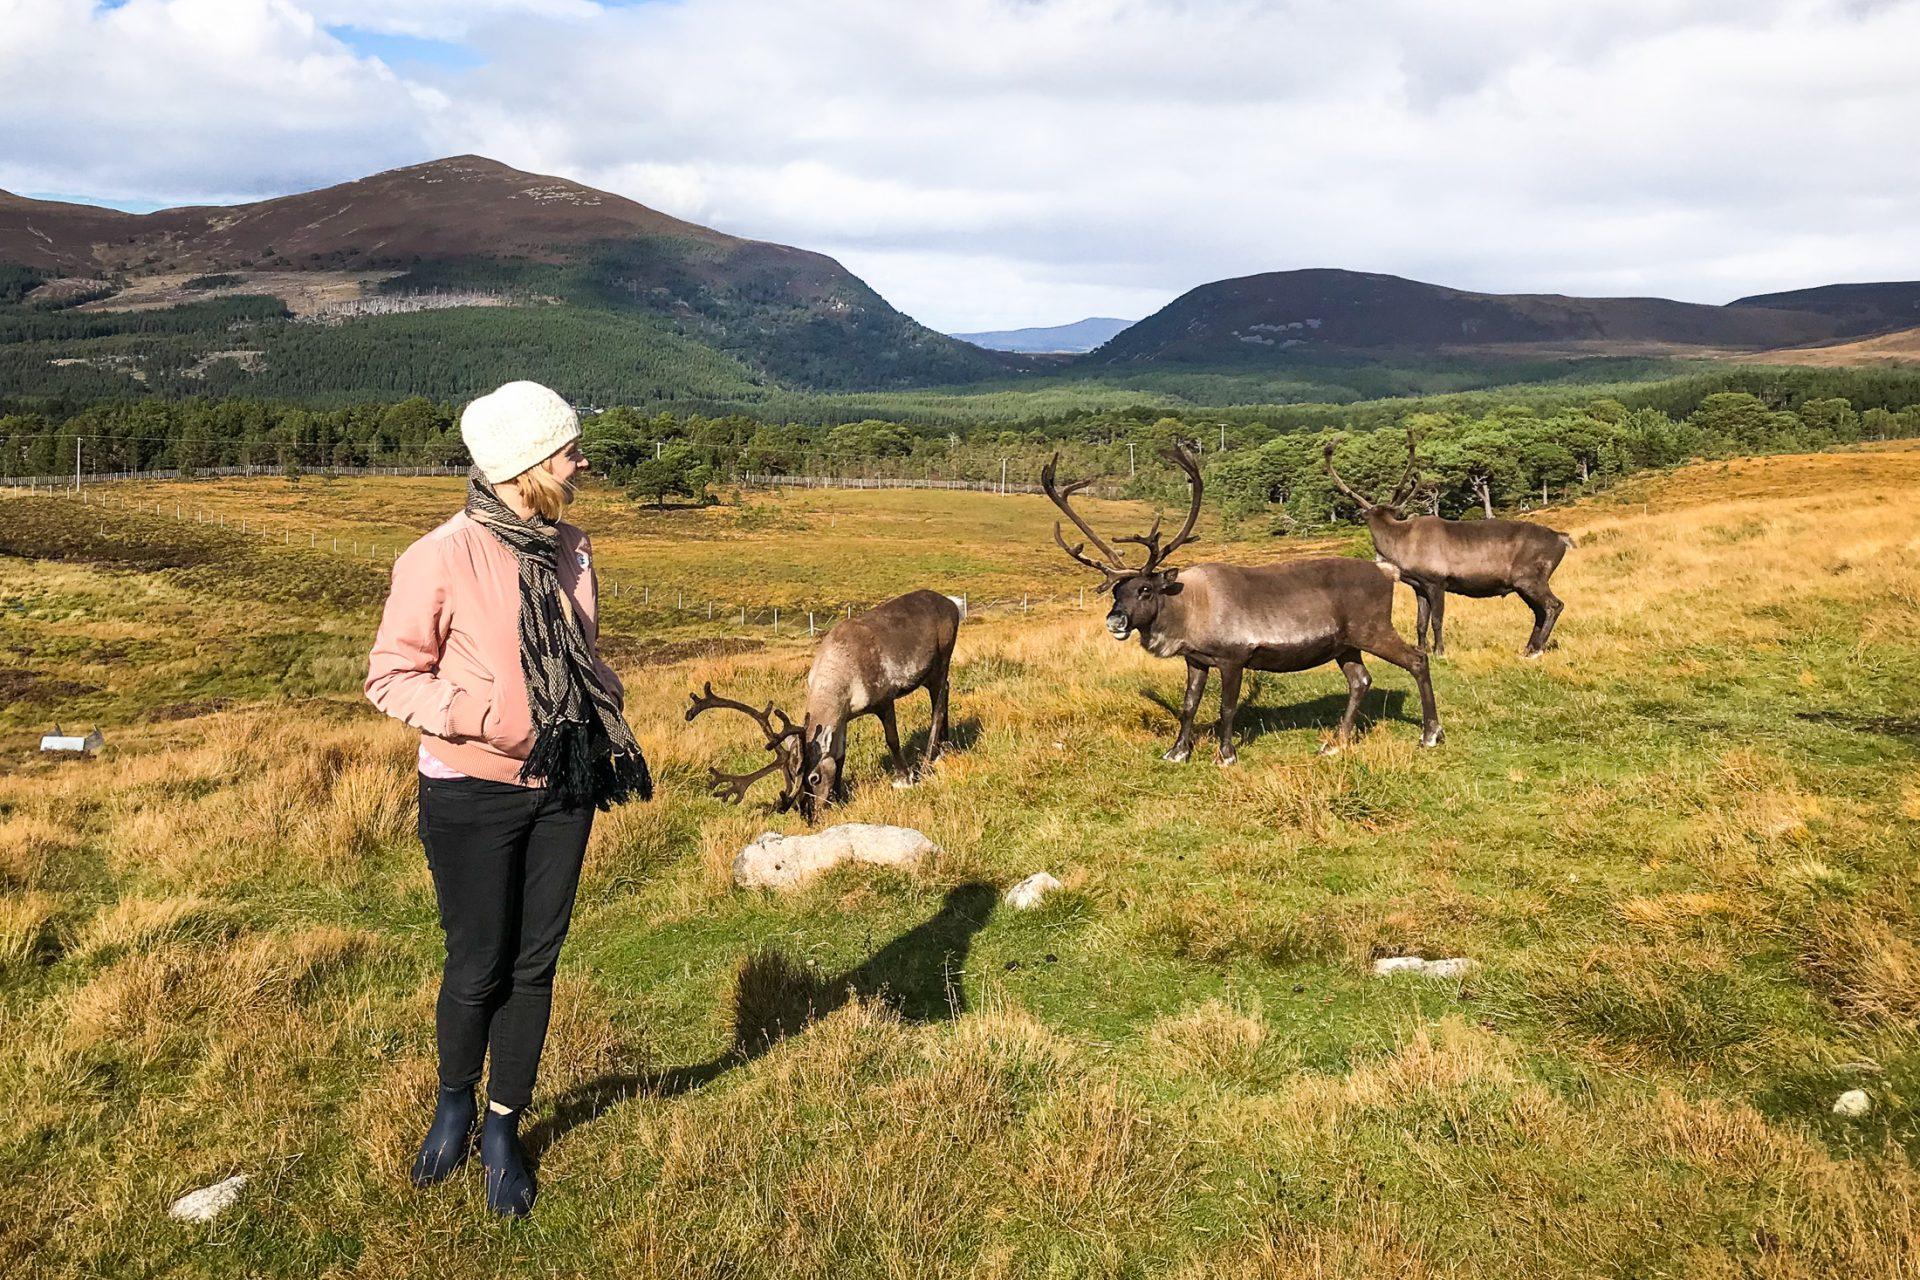 My best ever wildlife adventure: Making friends with reindeer in Scotland